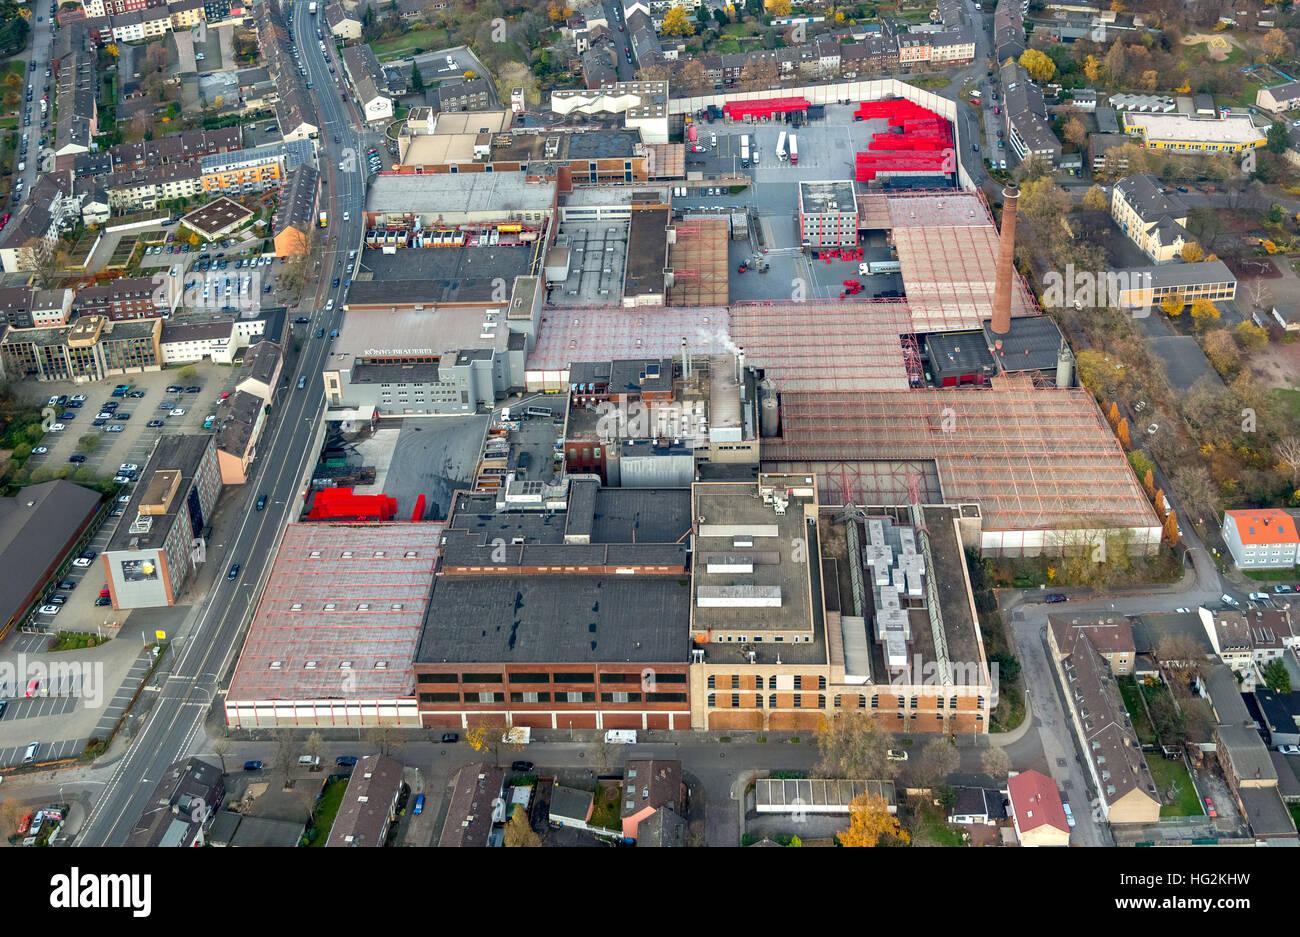 Aerial view, König-Brauerei GmbH, könig brewery, beer, Köpi Beer Duisburg, Beeck, district of Duisburg - Stock Image